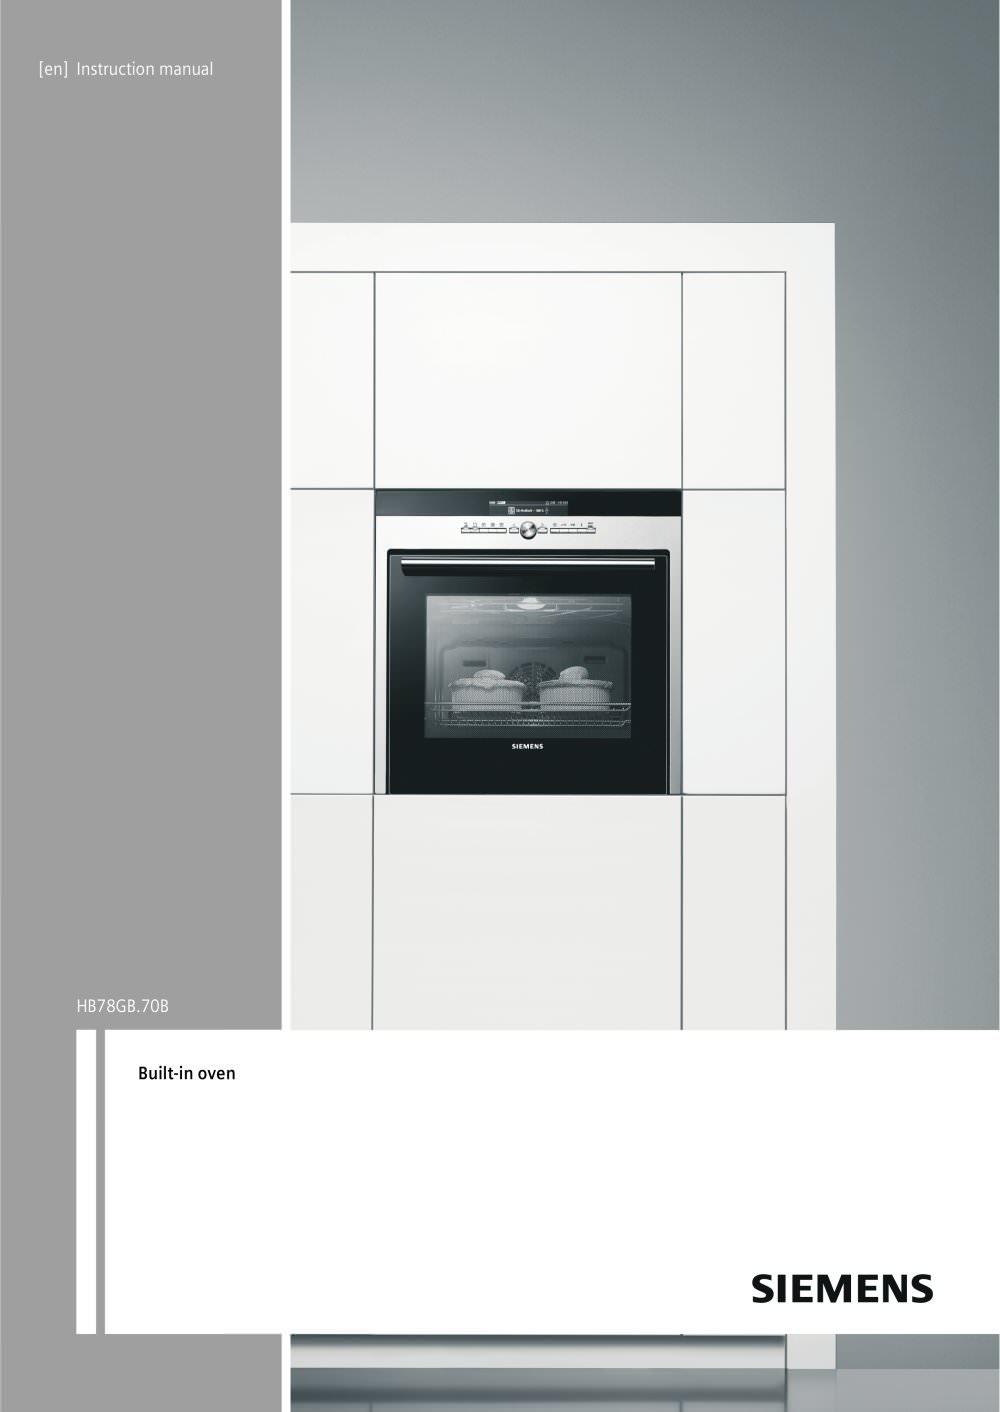 90007104181 siemens home appliances pdf catalogues rh pdf archiexpo com Bosch Appliances siemens home appliances user manuals